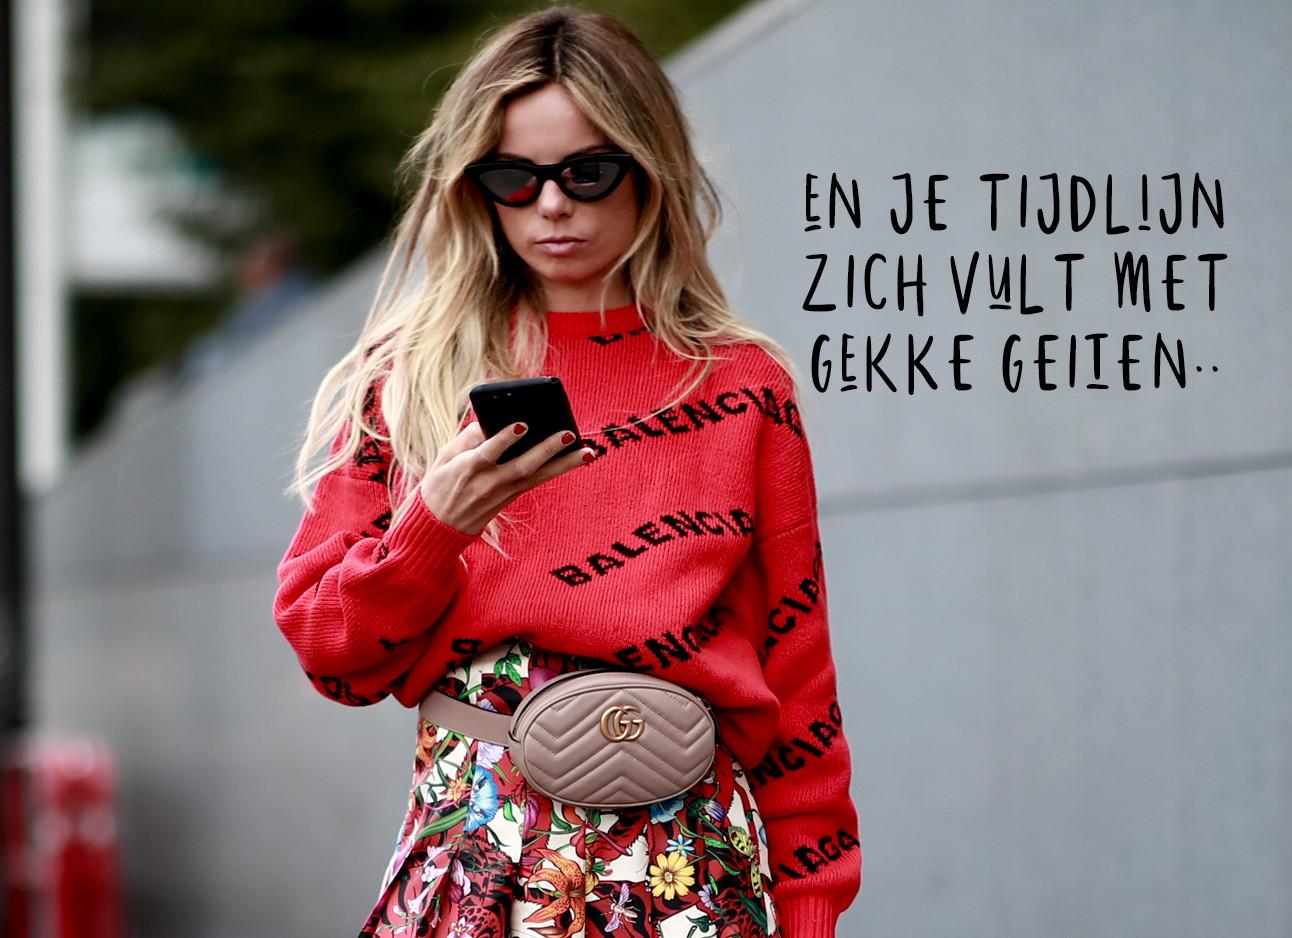 vrouw rode outfit zonnebril mobiel